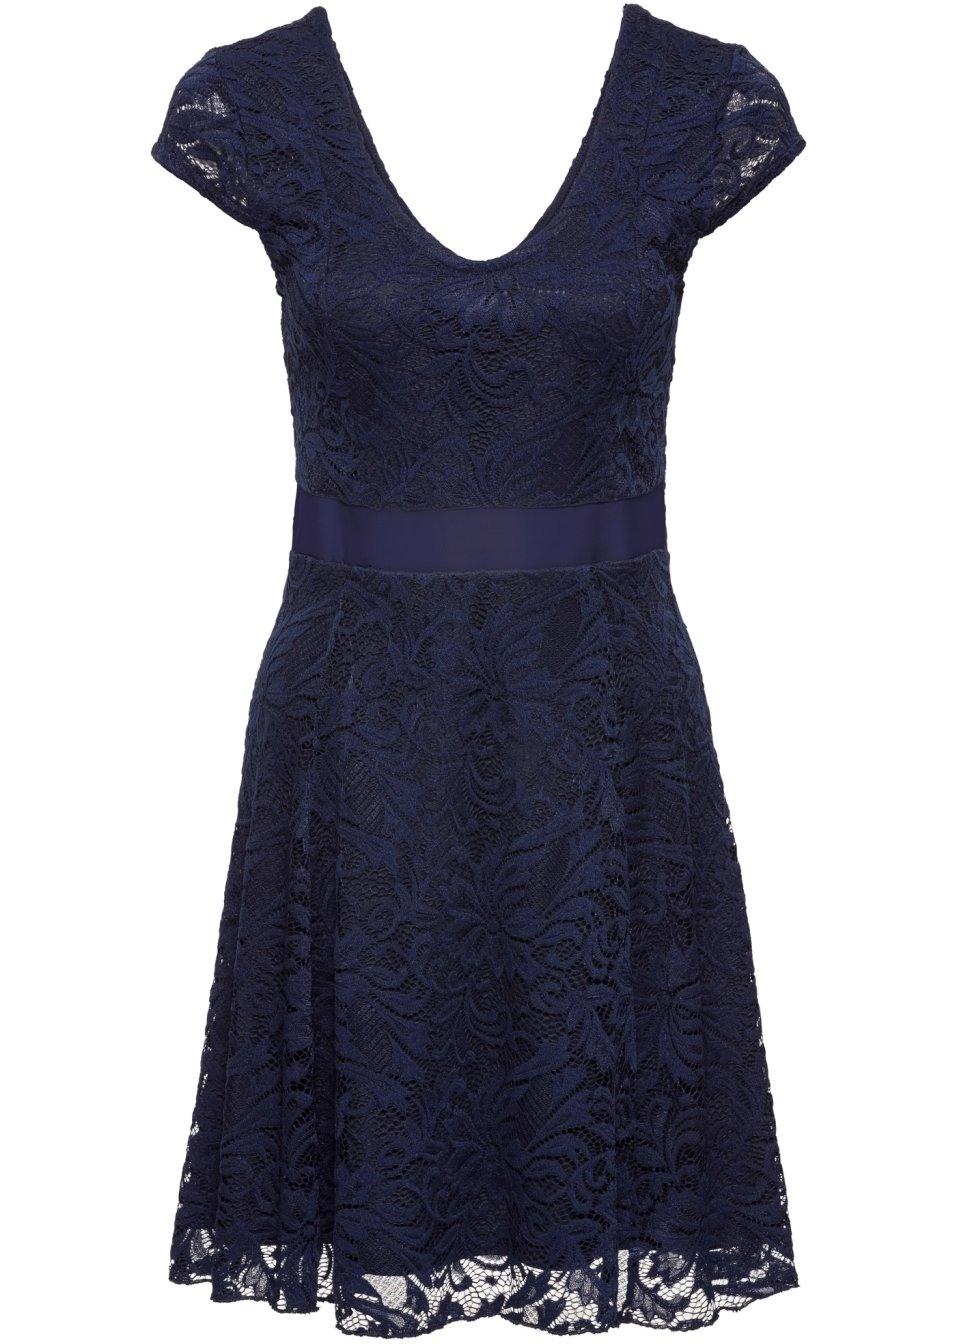 Spektakulär Kleid Dunkelblau Spitze DesignAbend Luxus Kleid Dunkelblau Spitze Design